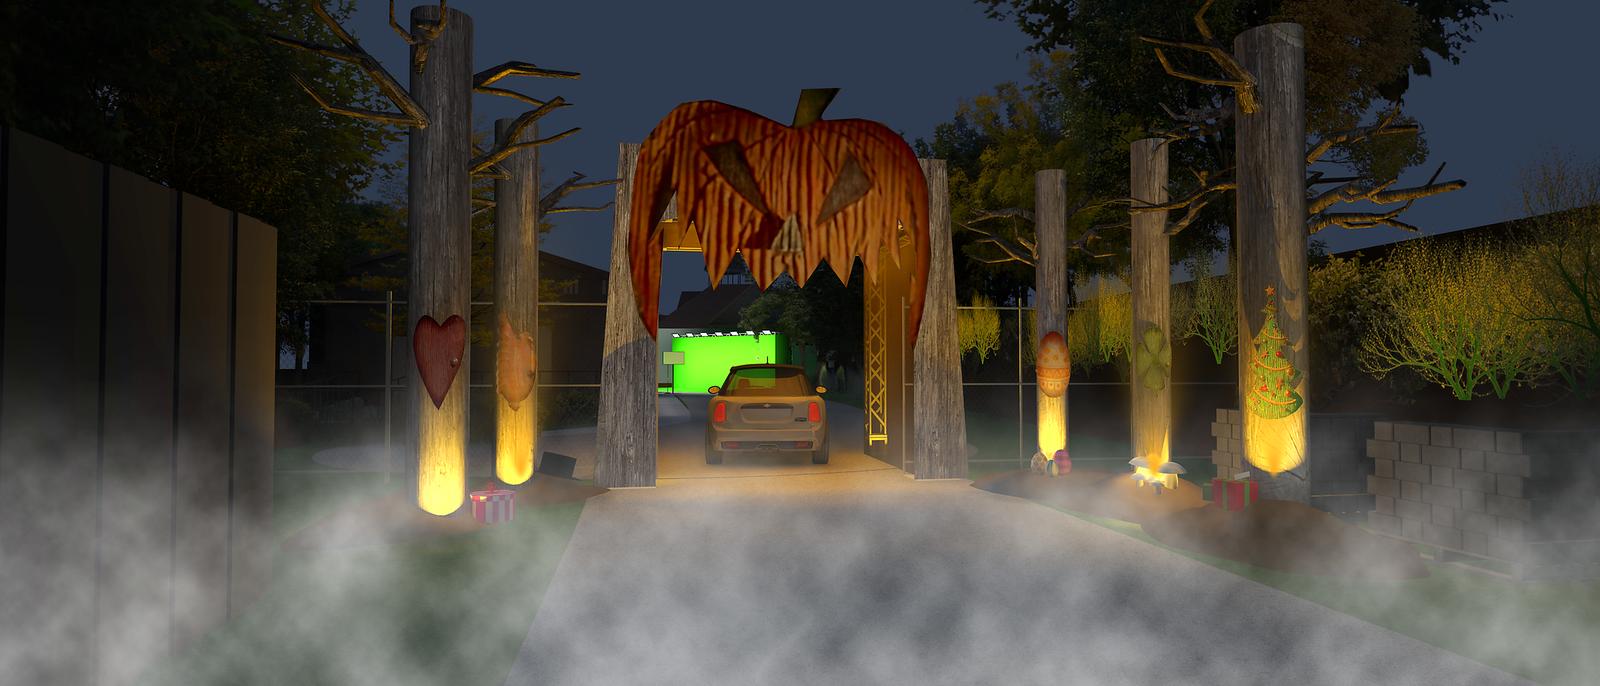 Freeform's Halloween Road 2020